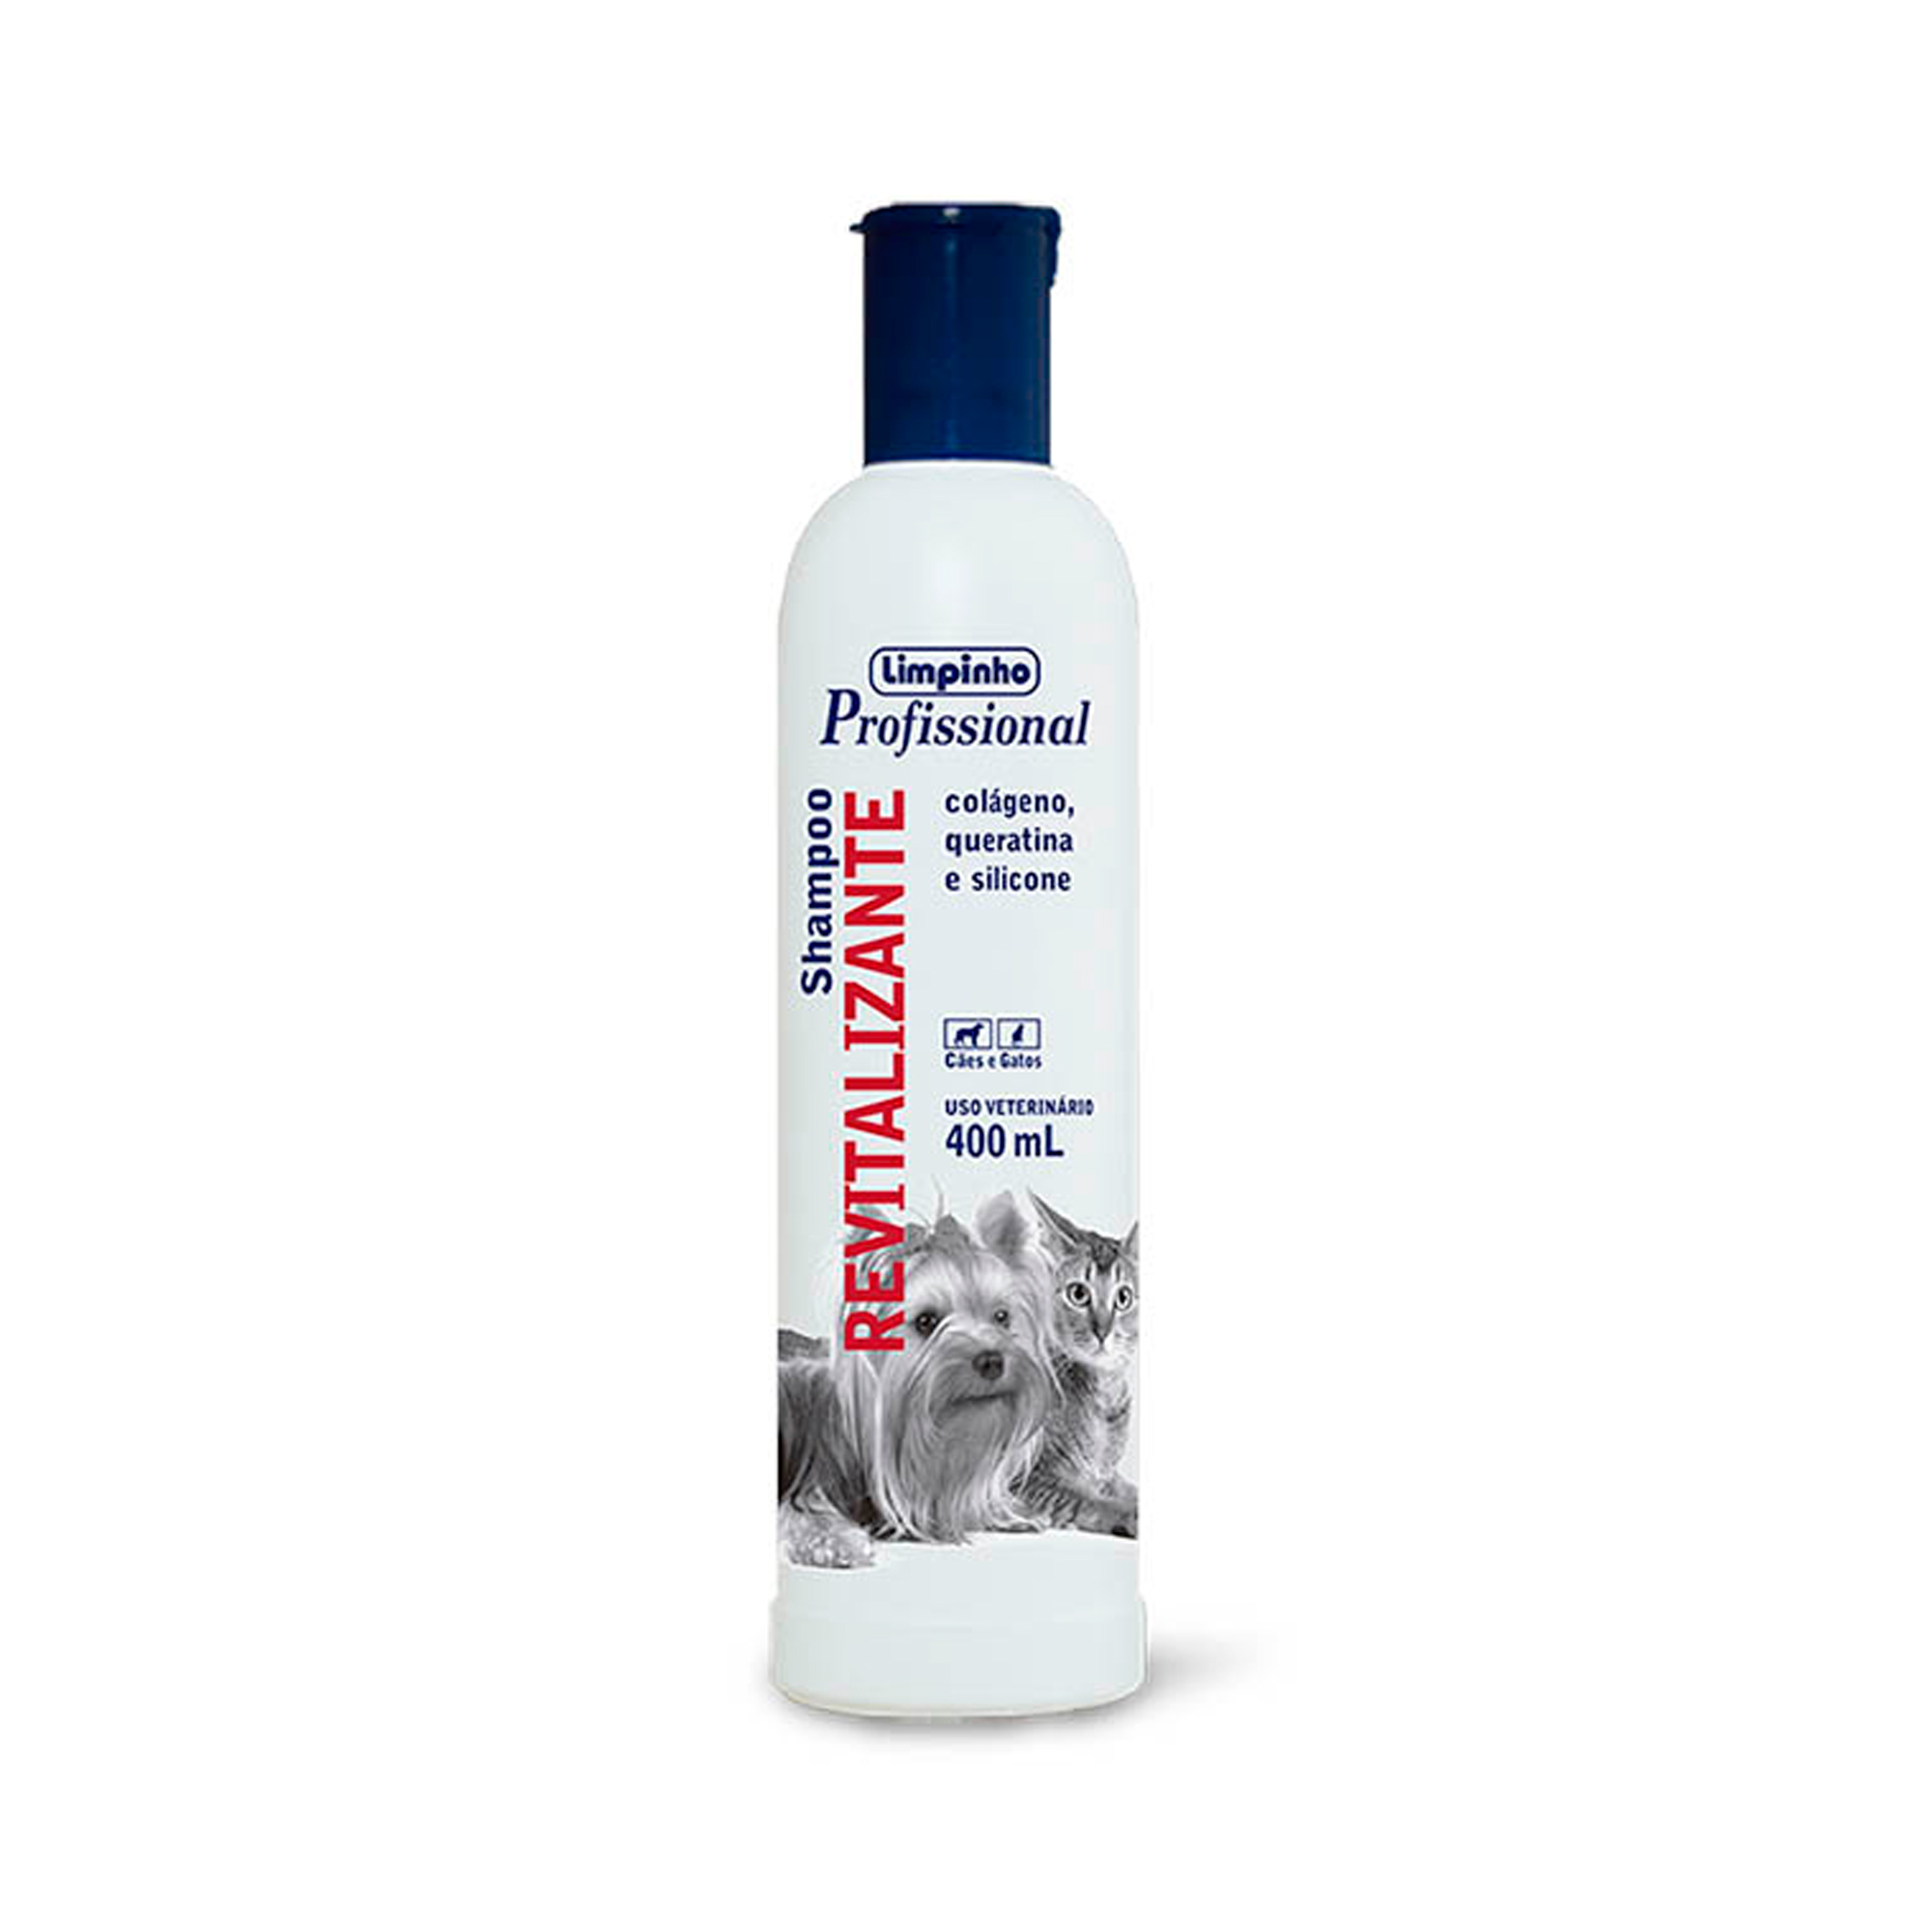 Shampoo Profissional Revitalizante Limpinho 400ml